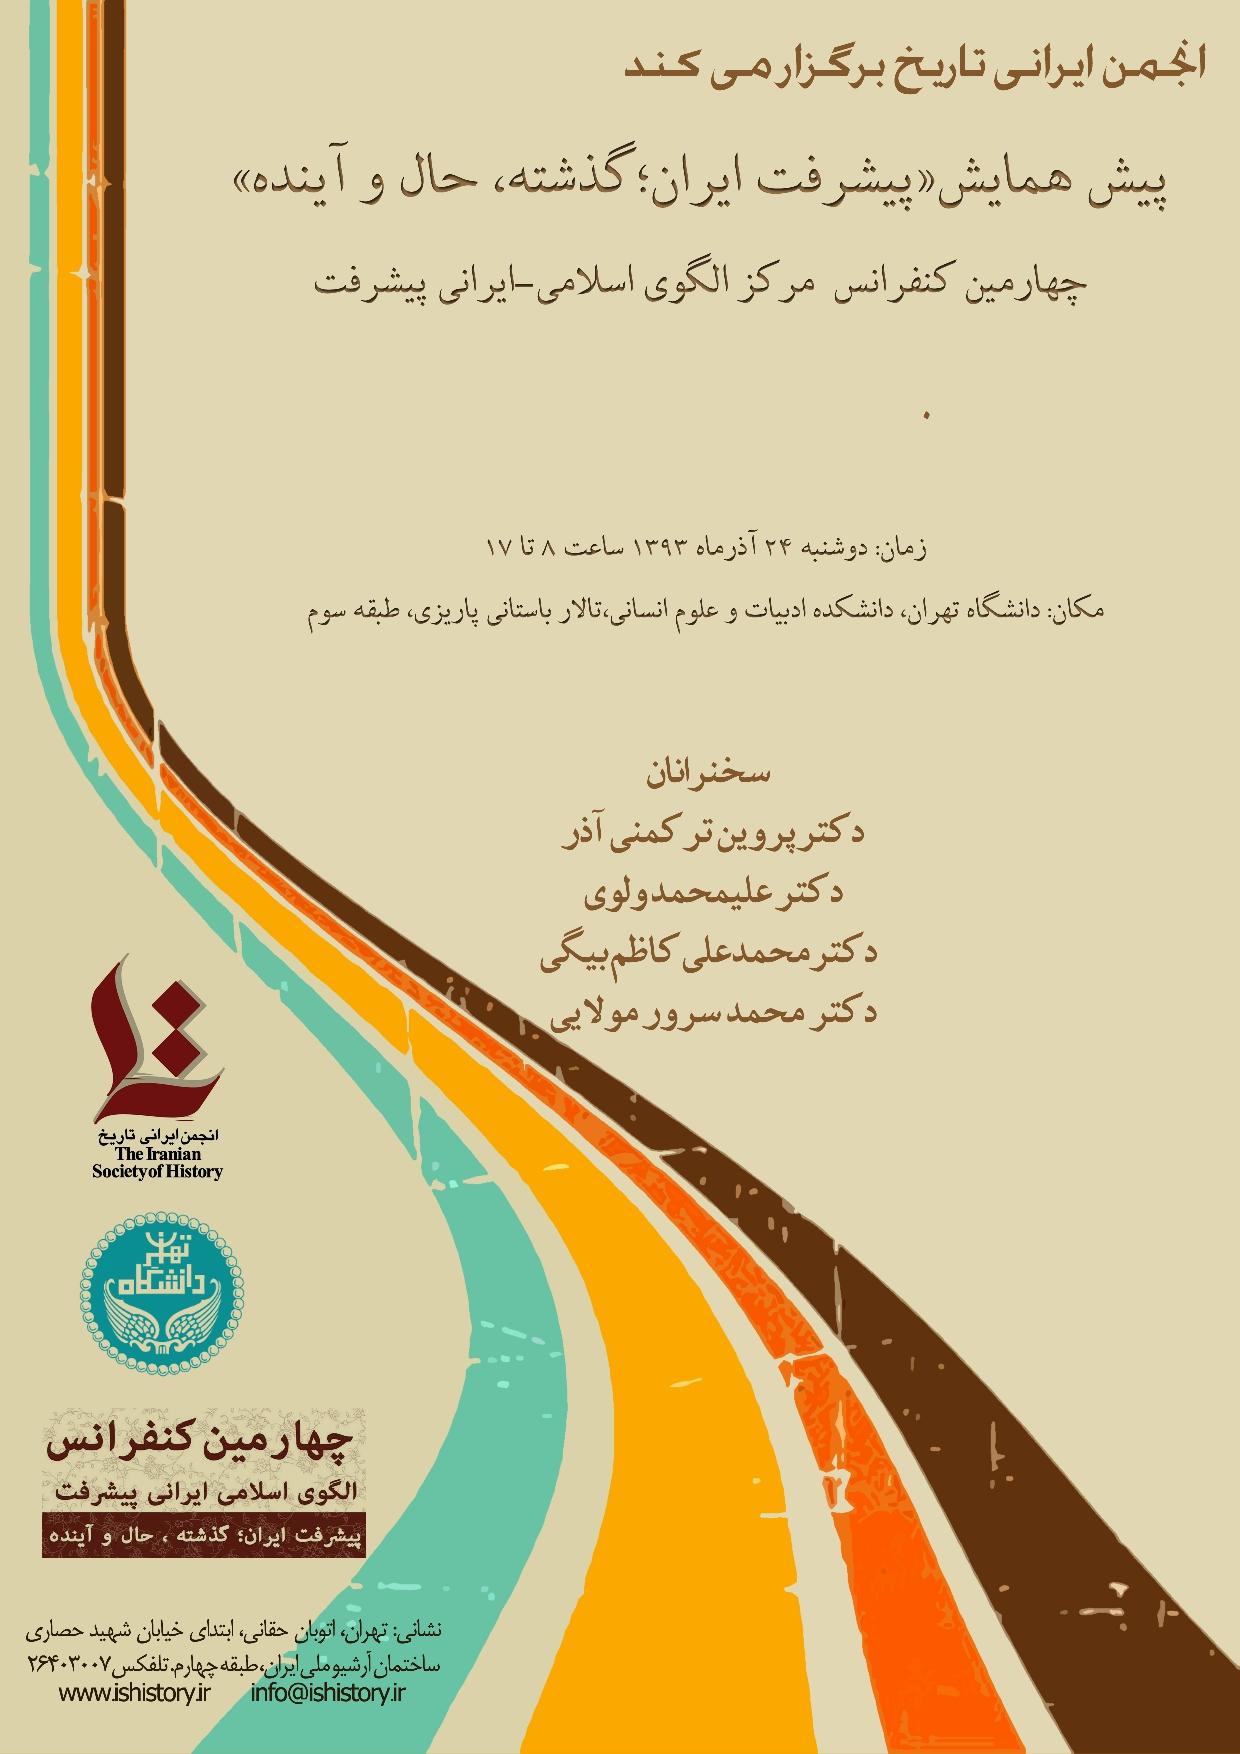 pishhamayesh برگزاری پیشهمایش «پیشرفت ایران؛ گذشته، حال و آینده»